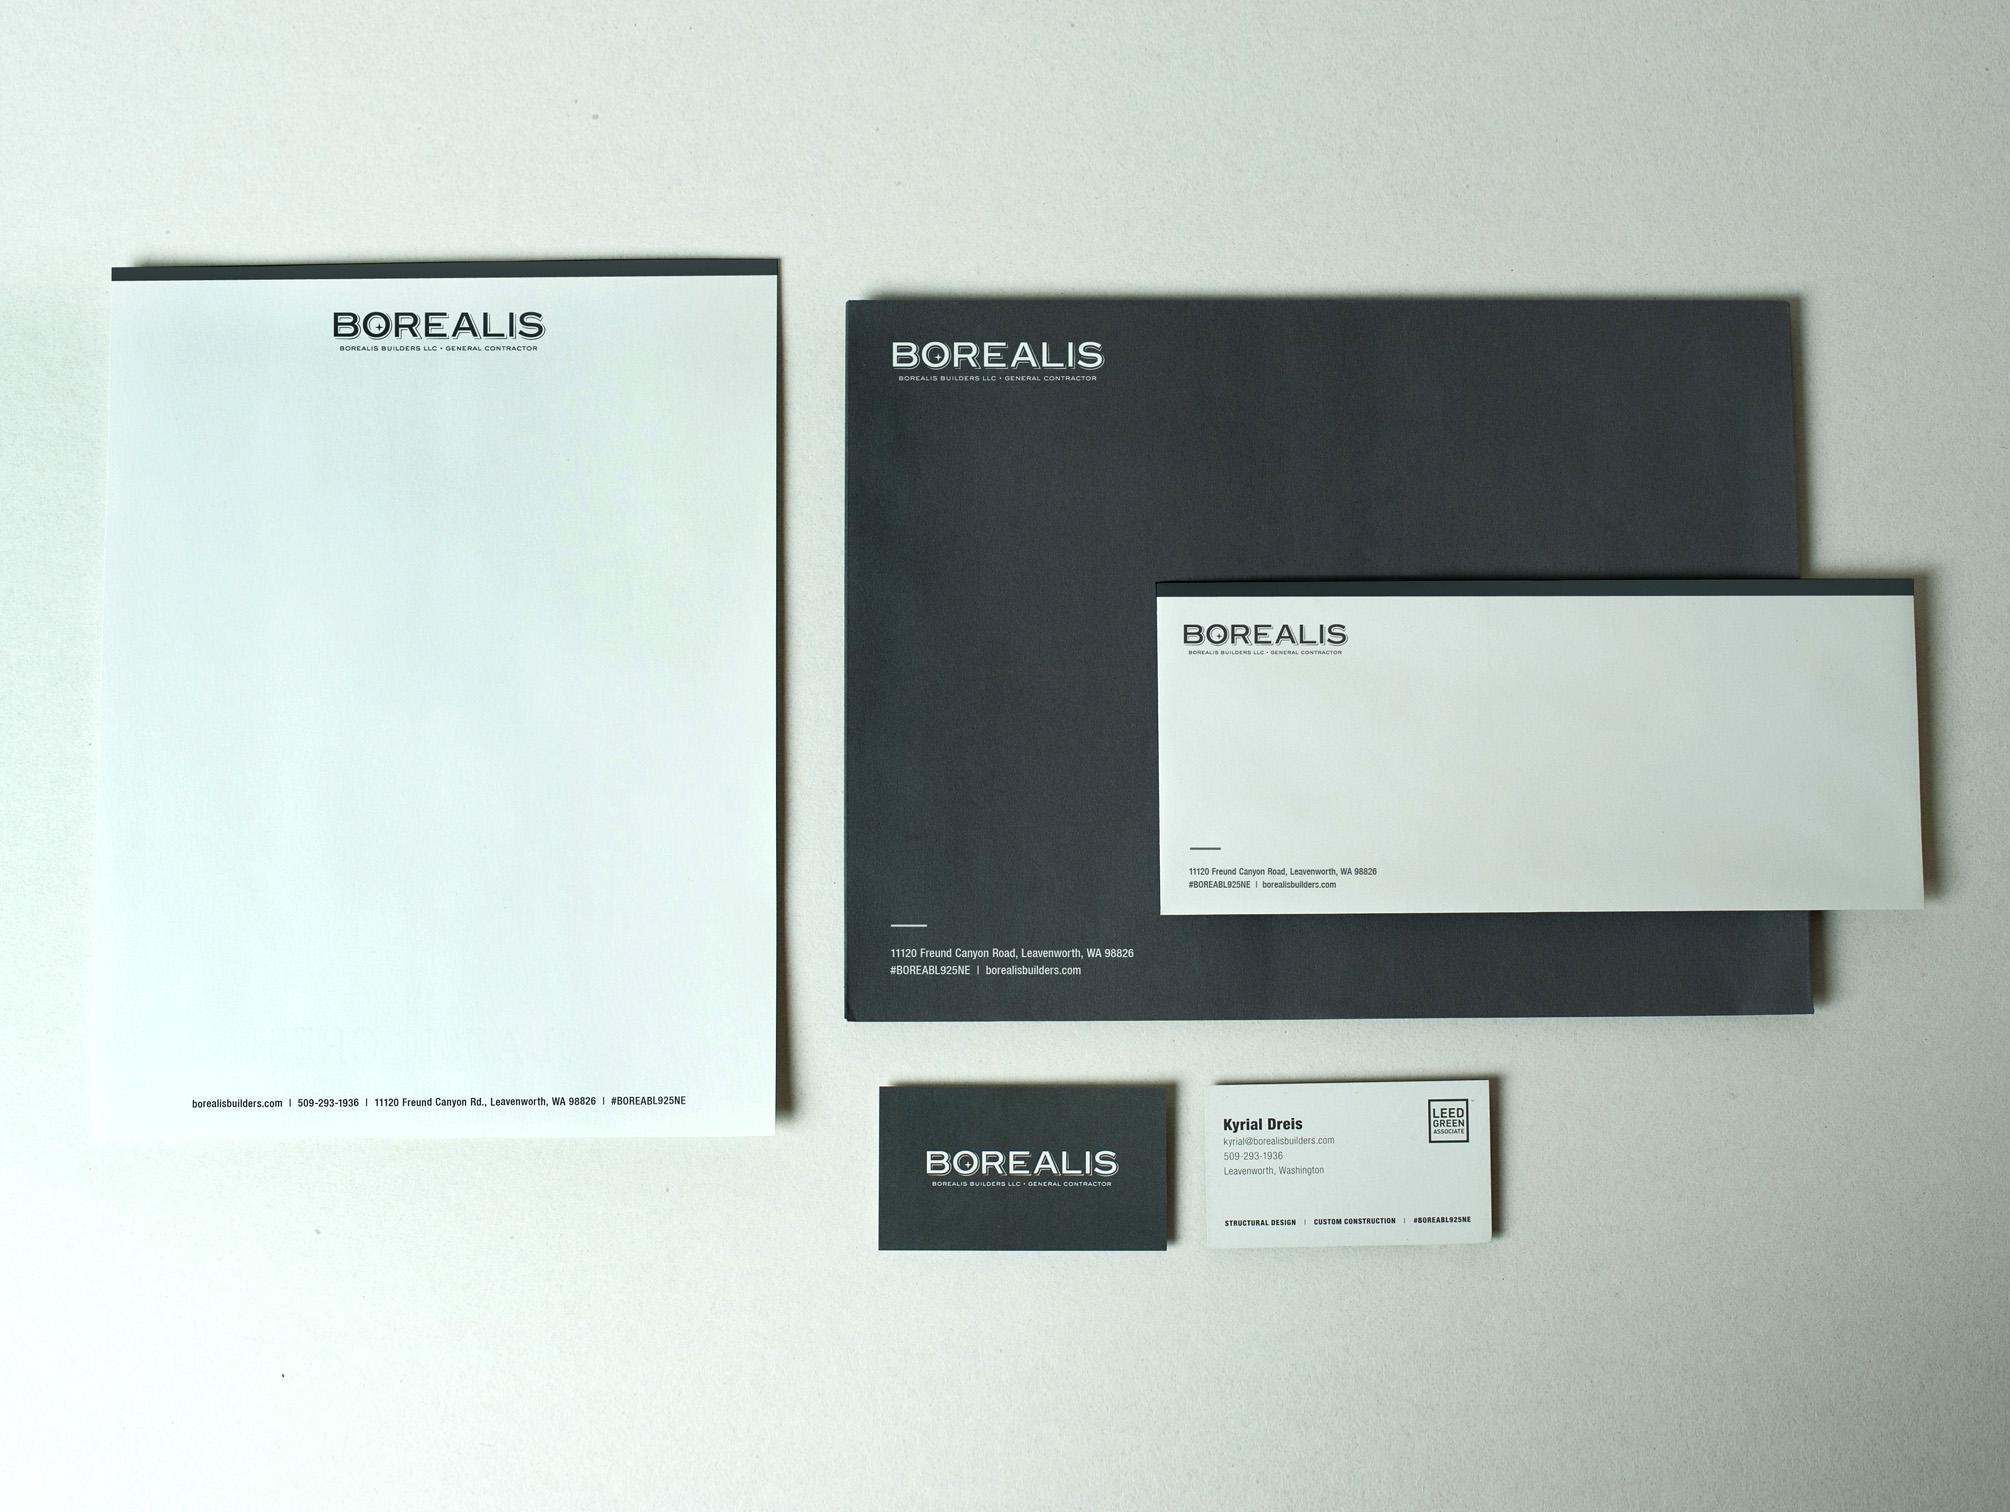 borealis2.jpg